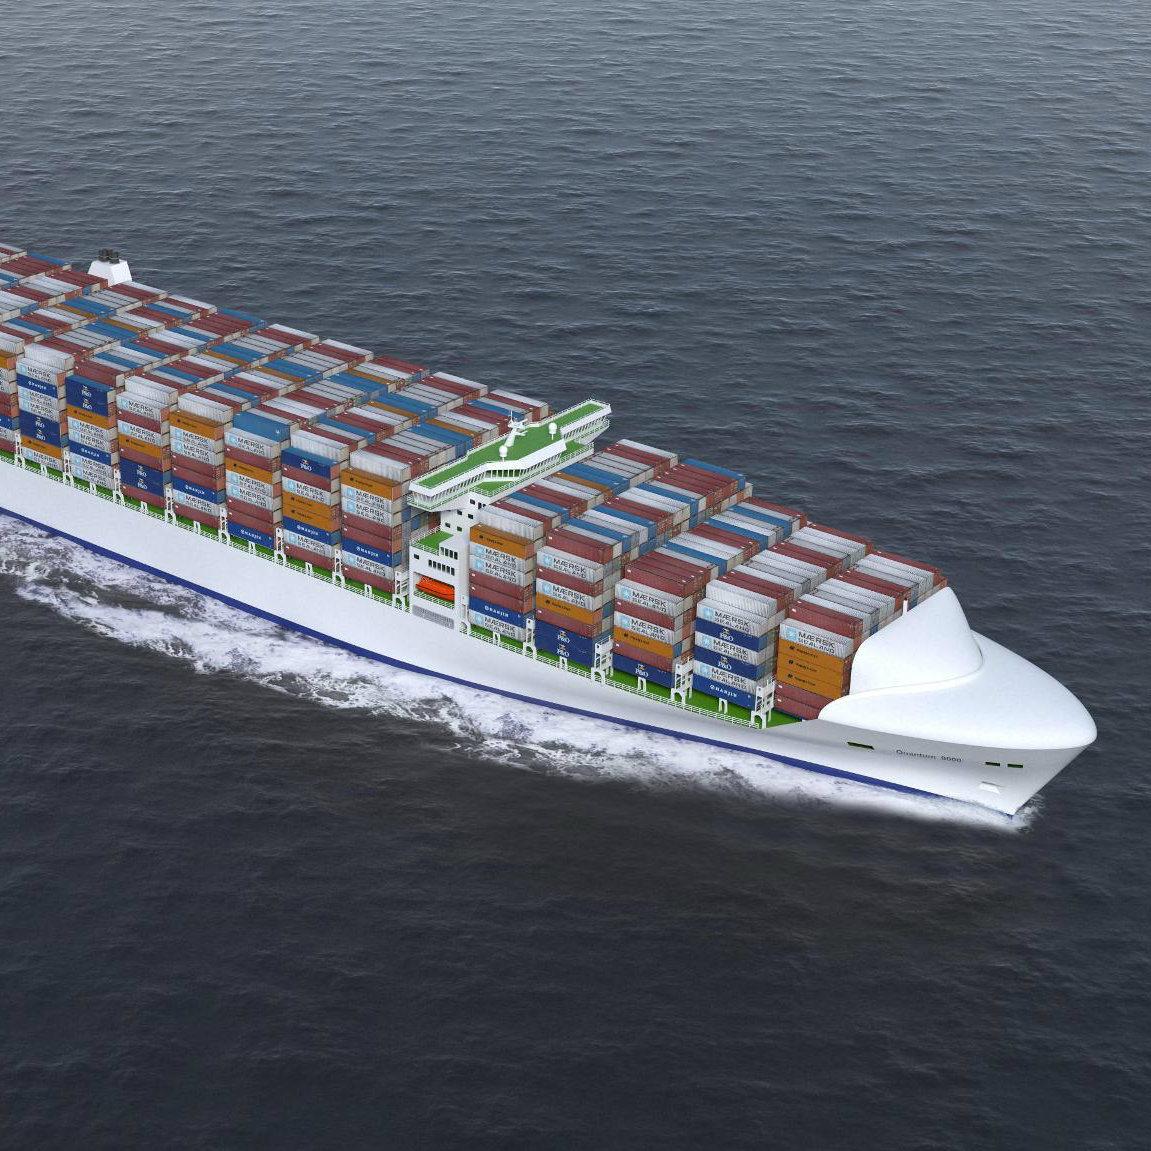 Best Shipment Service